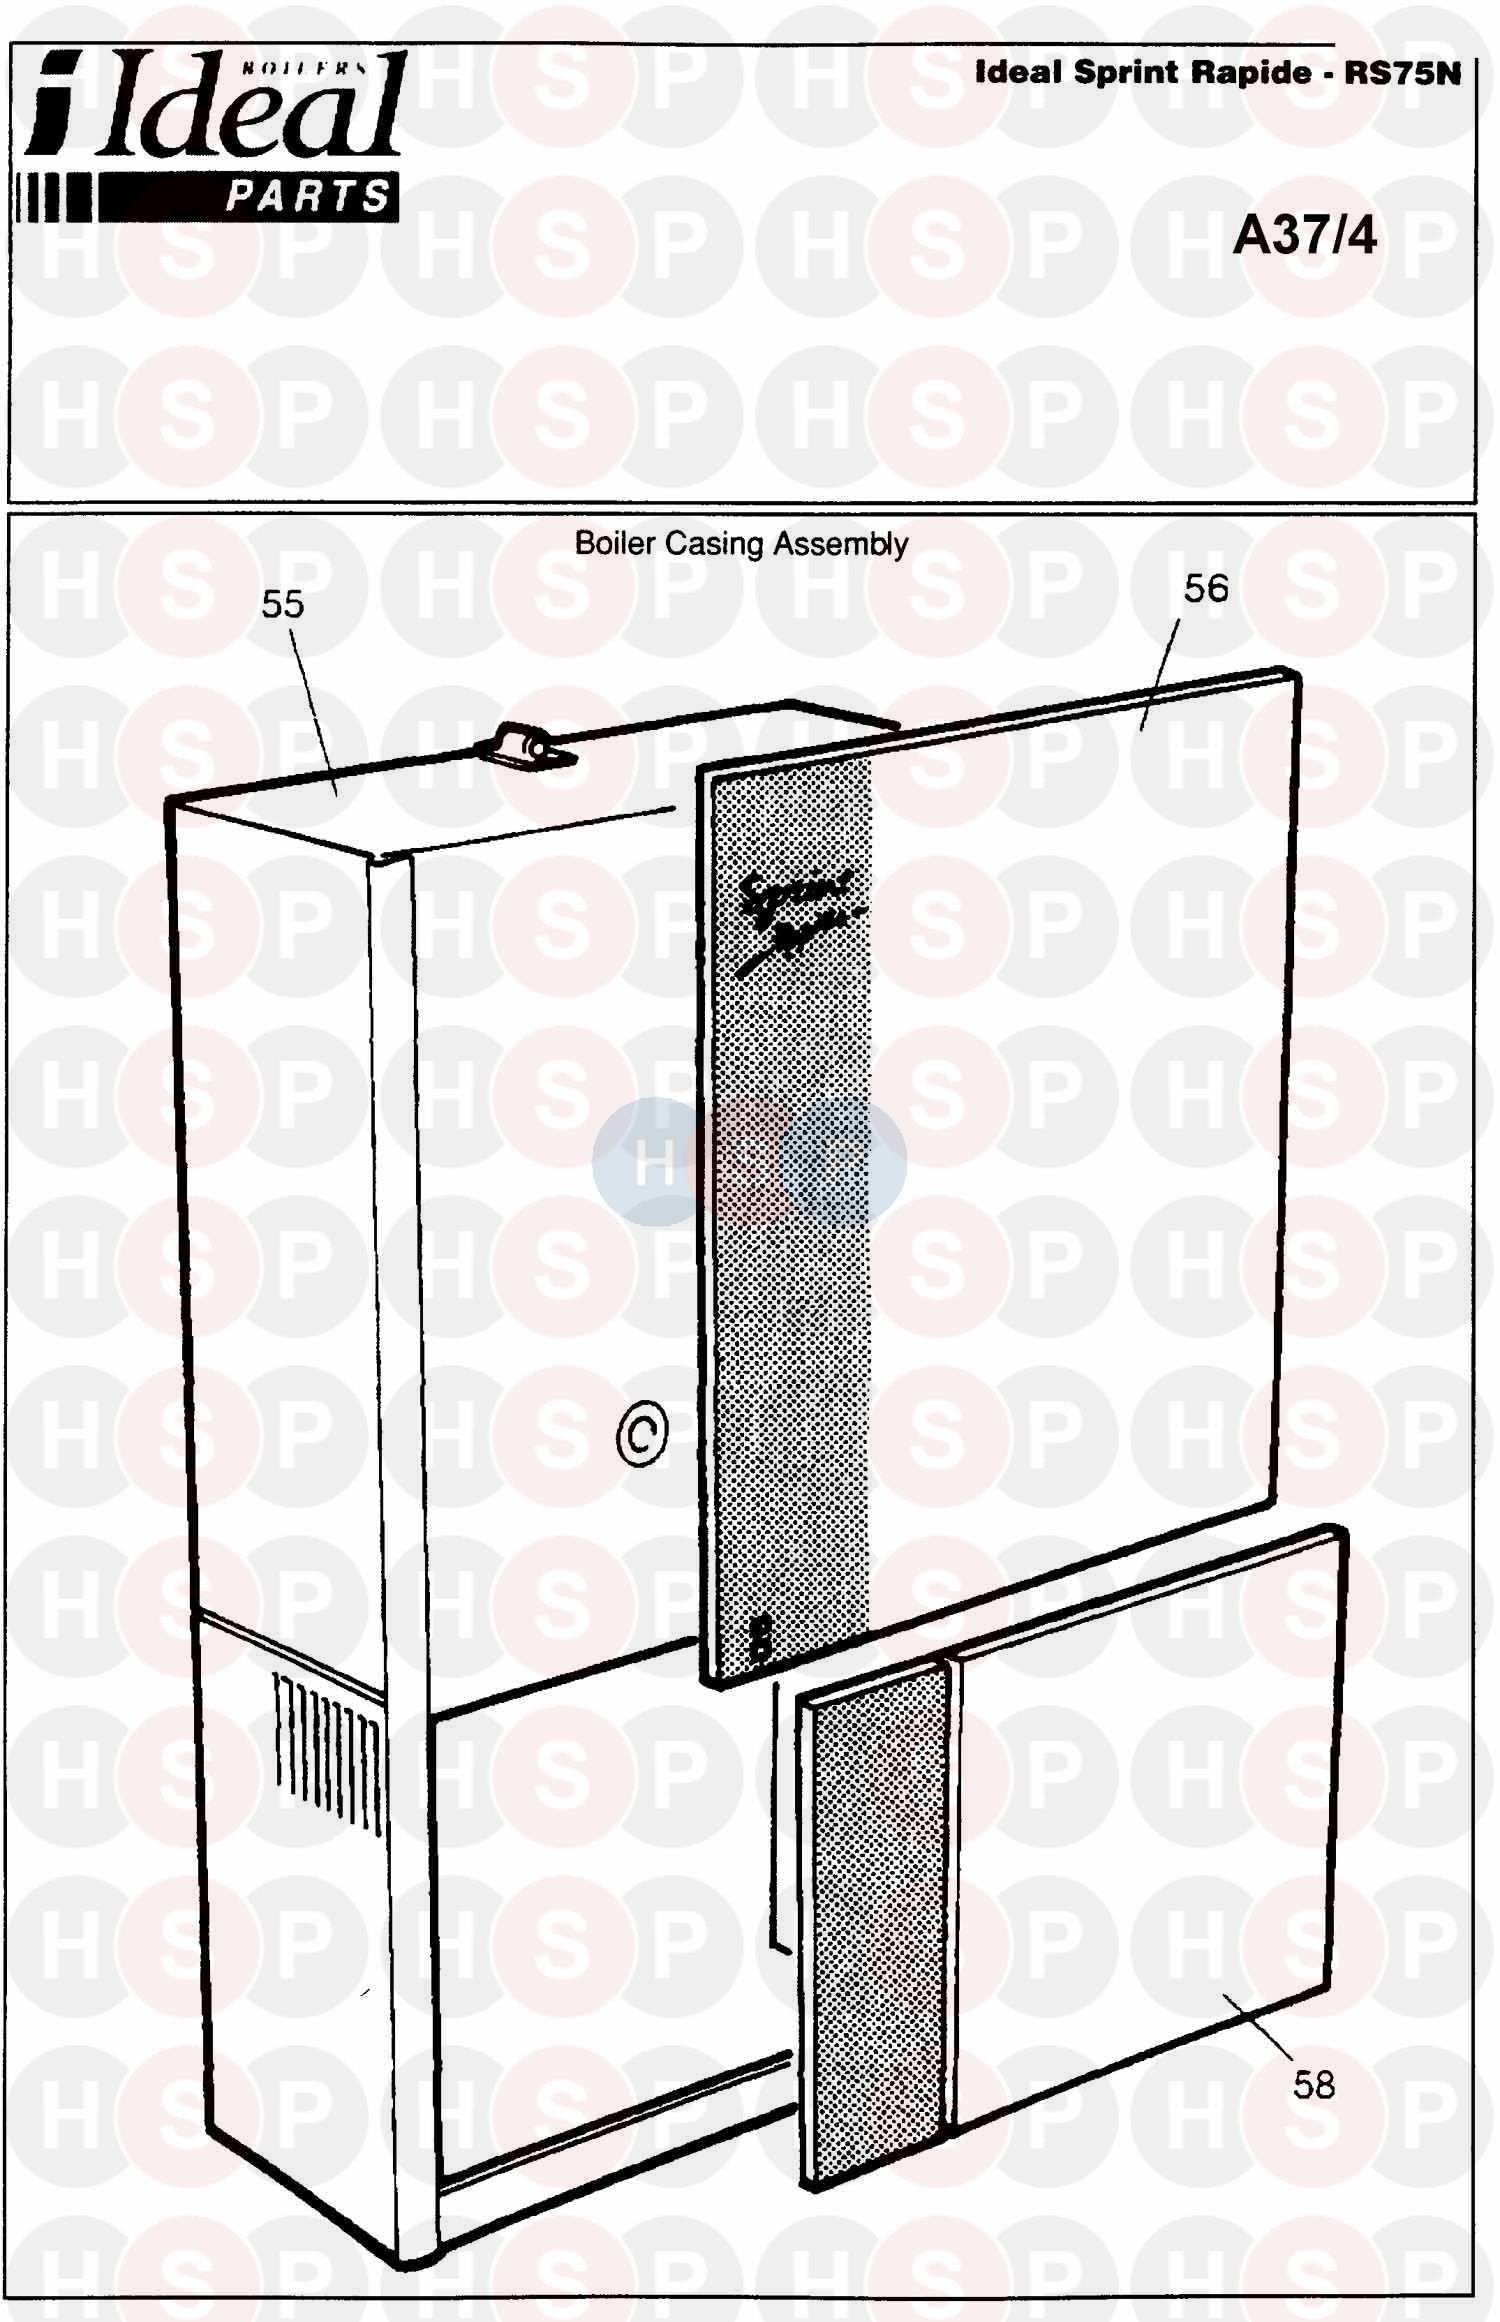 Ideal SPRINT RAPIDE RS 75N (Boiler Casing) Diagram | Heating